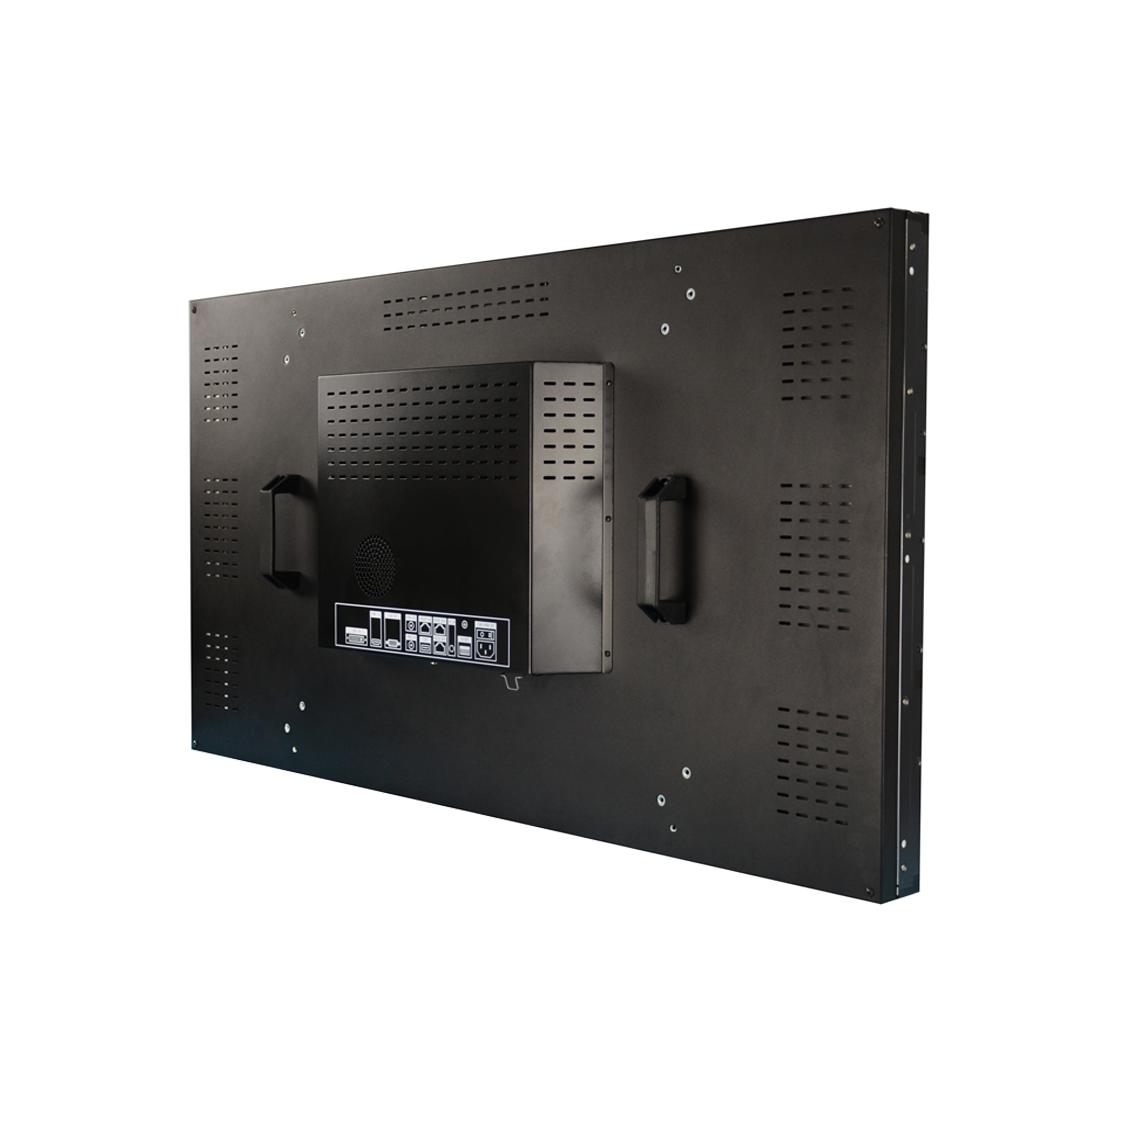 55寸3.5毫米LED拼接屏